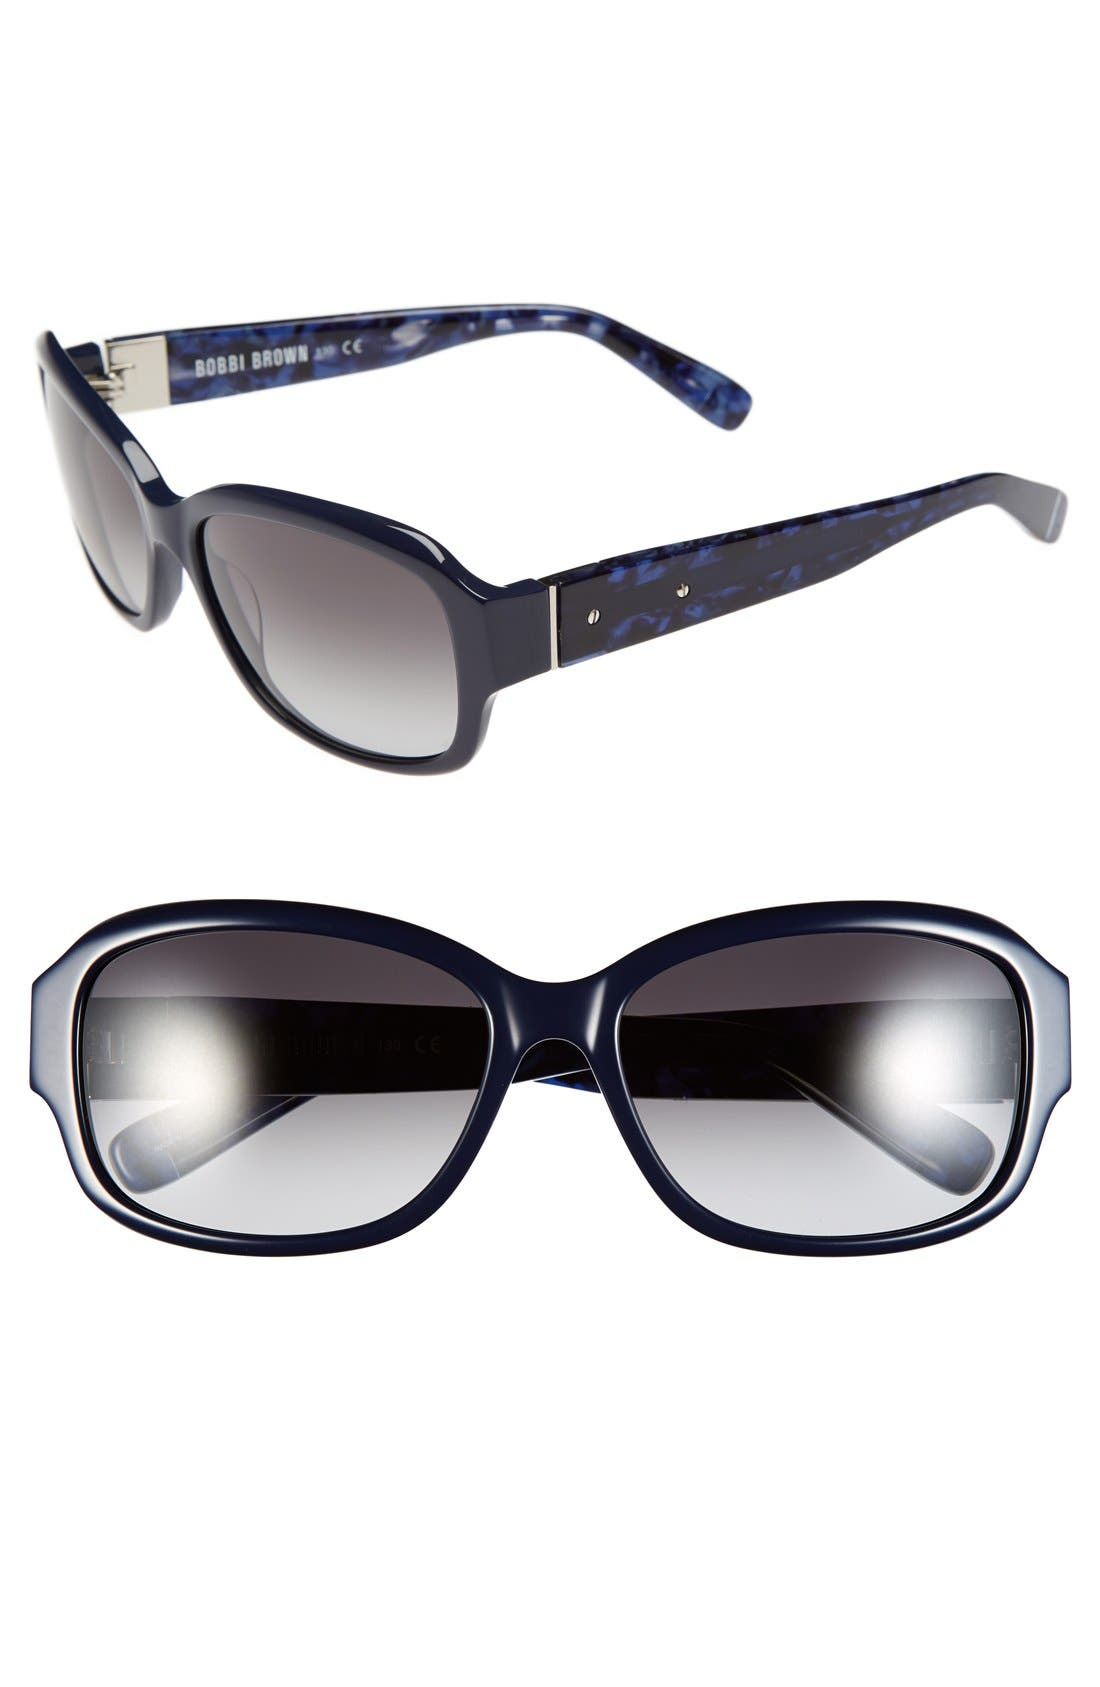 Alternate Image 1 Selected - Bobbi Brown 'The Sandra' 57mm Sunglasses